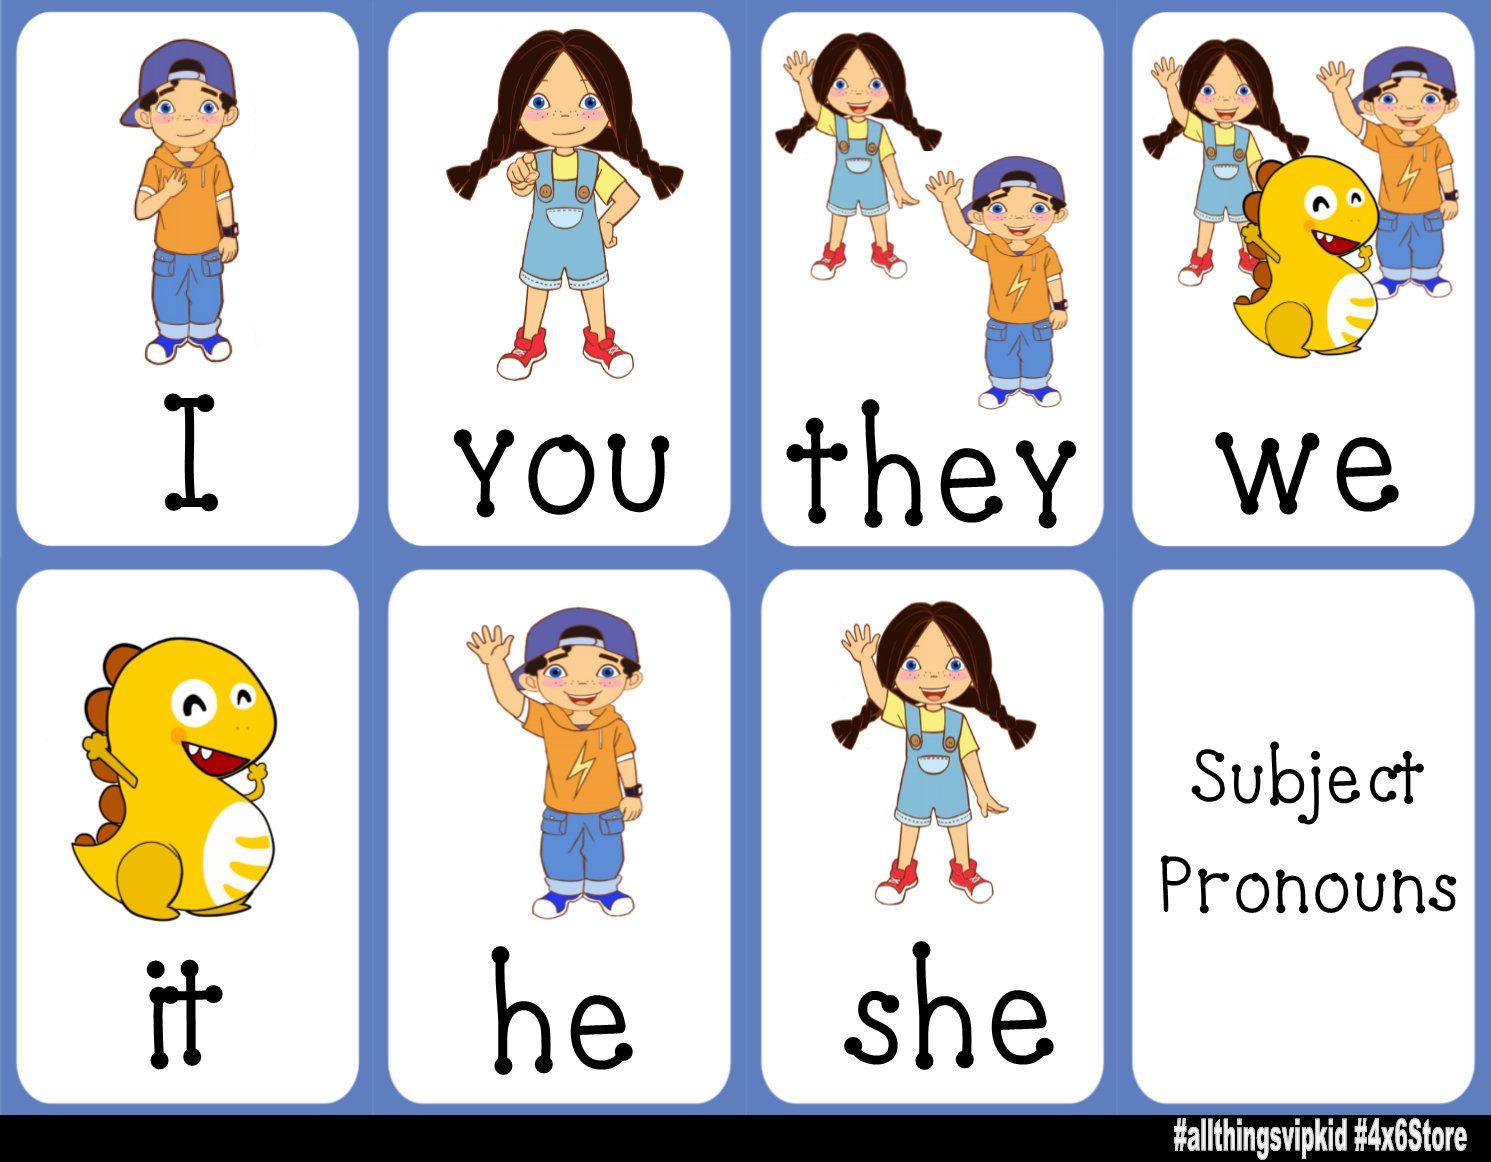 Vipkid Pronoun And Possessive Adjective Charts By Stuffbystephaniem On Etsy Ingles Para Preescolar Pronombres En Inglés Pronombres En Ingles Ejercicios